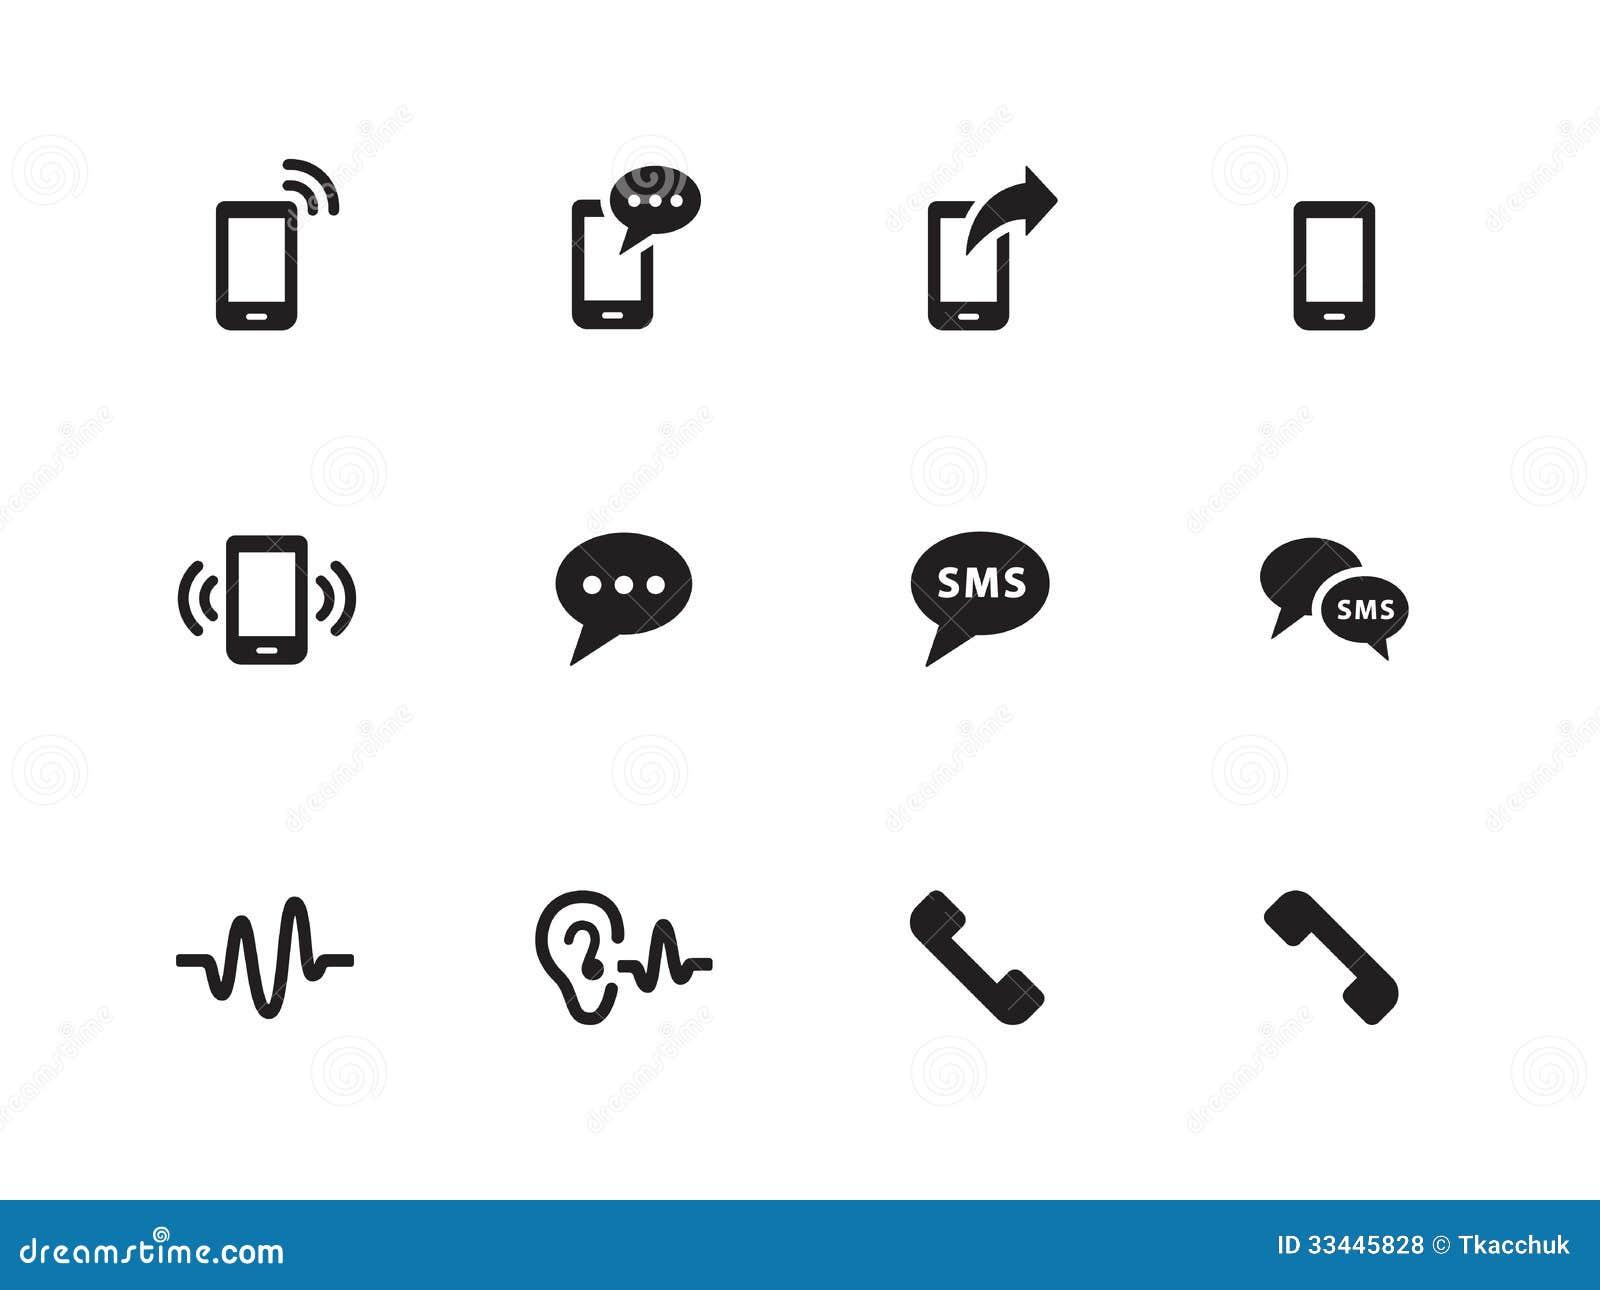 phone icons on white background  royalty free stock photos